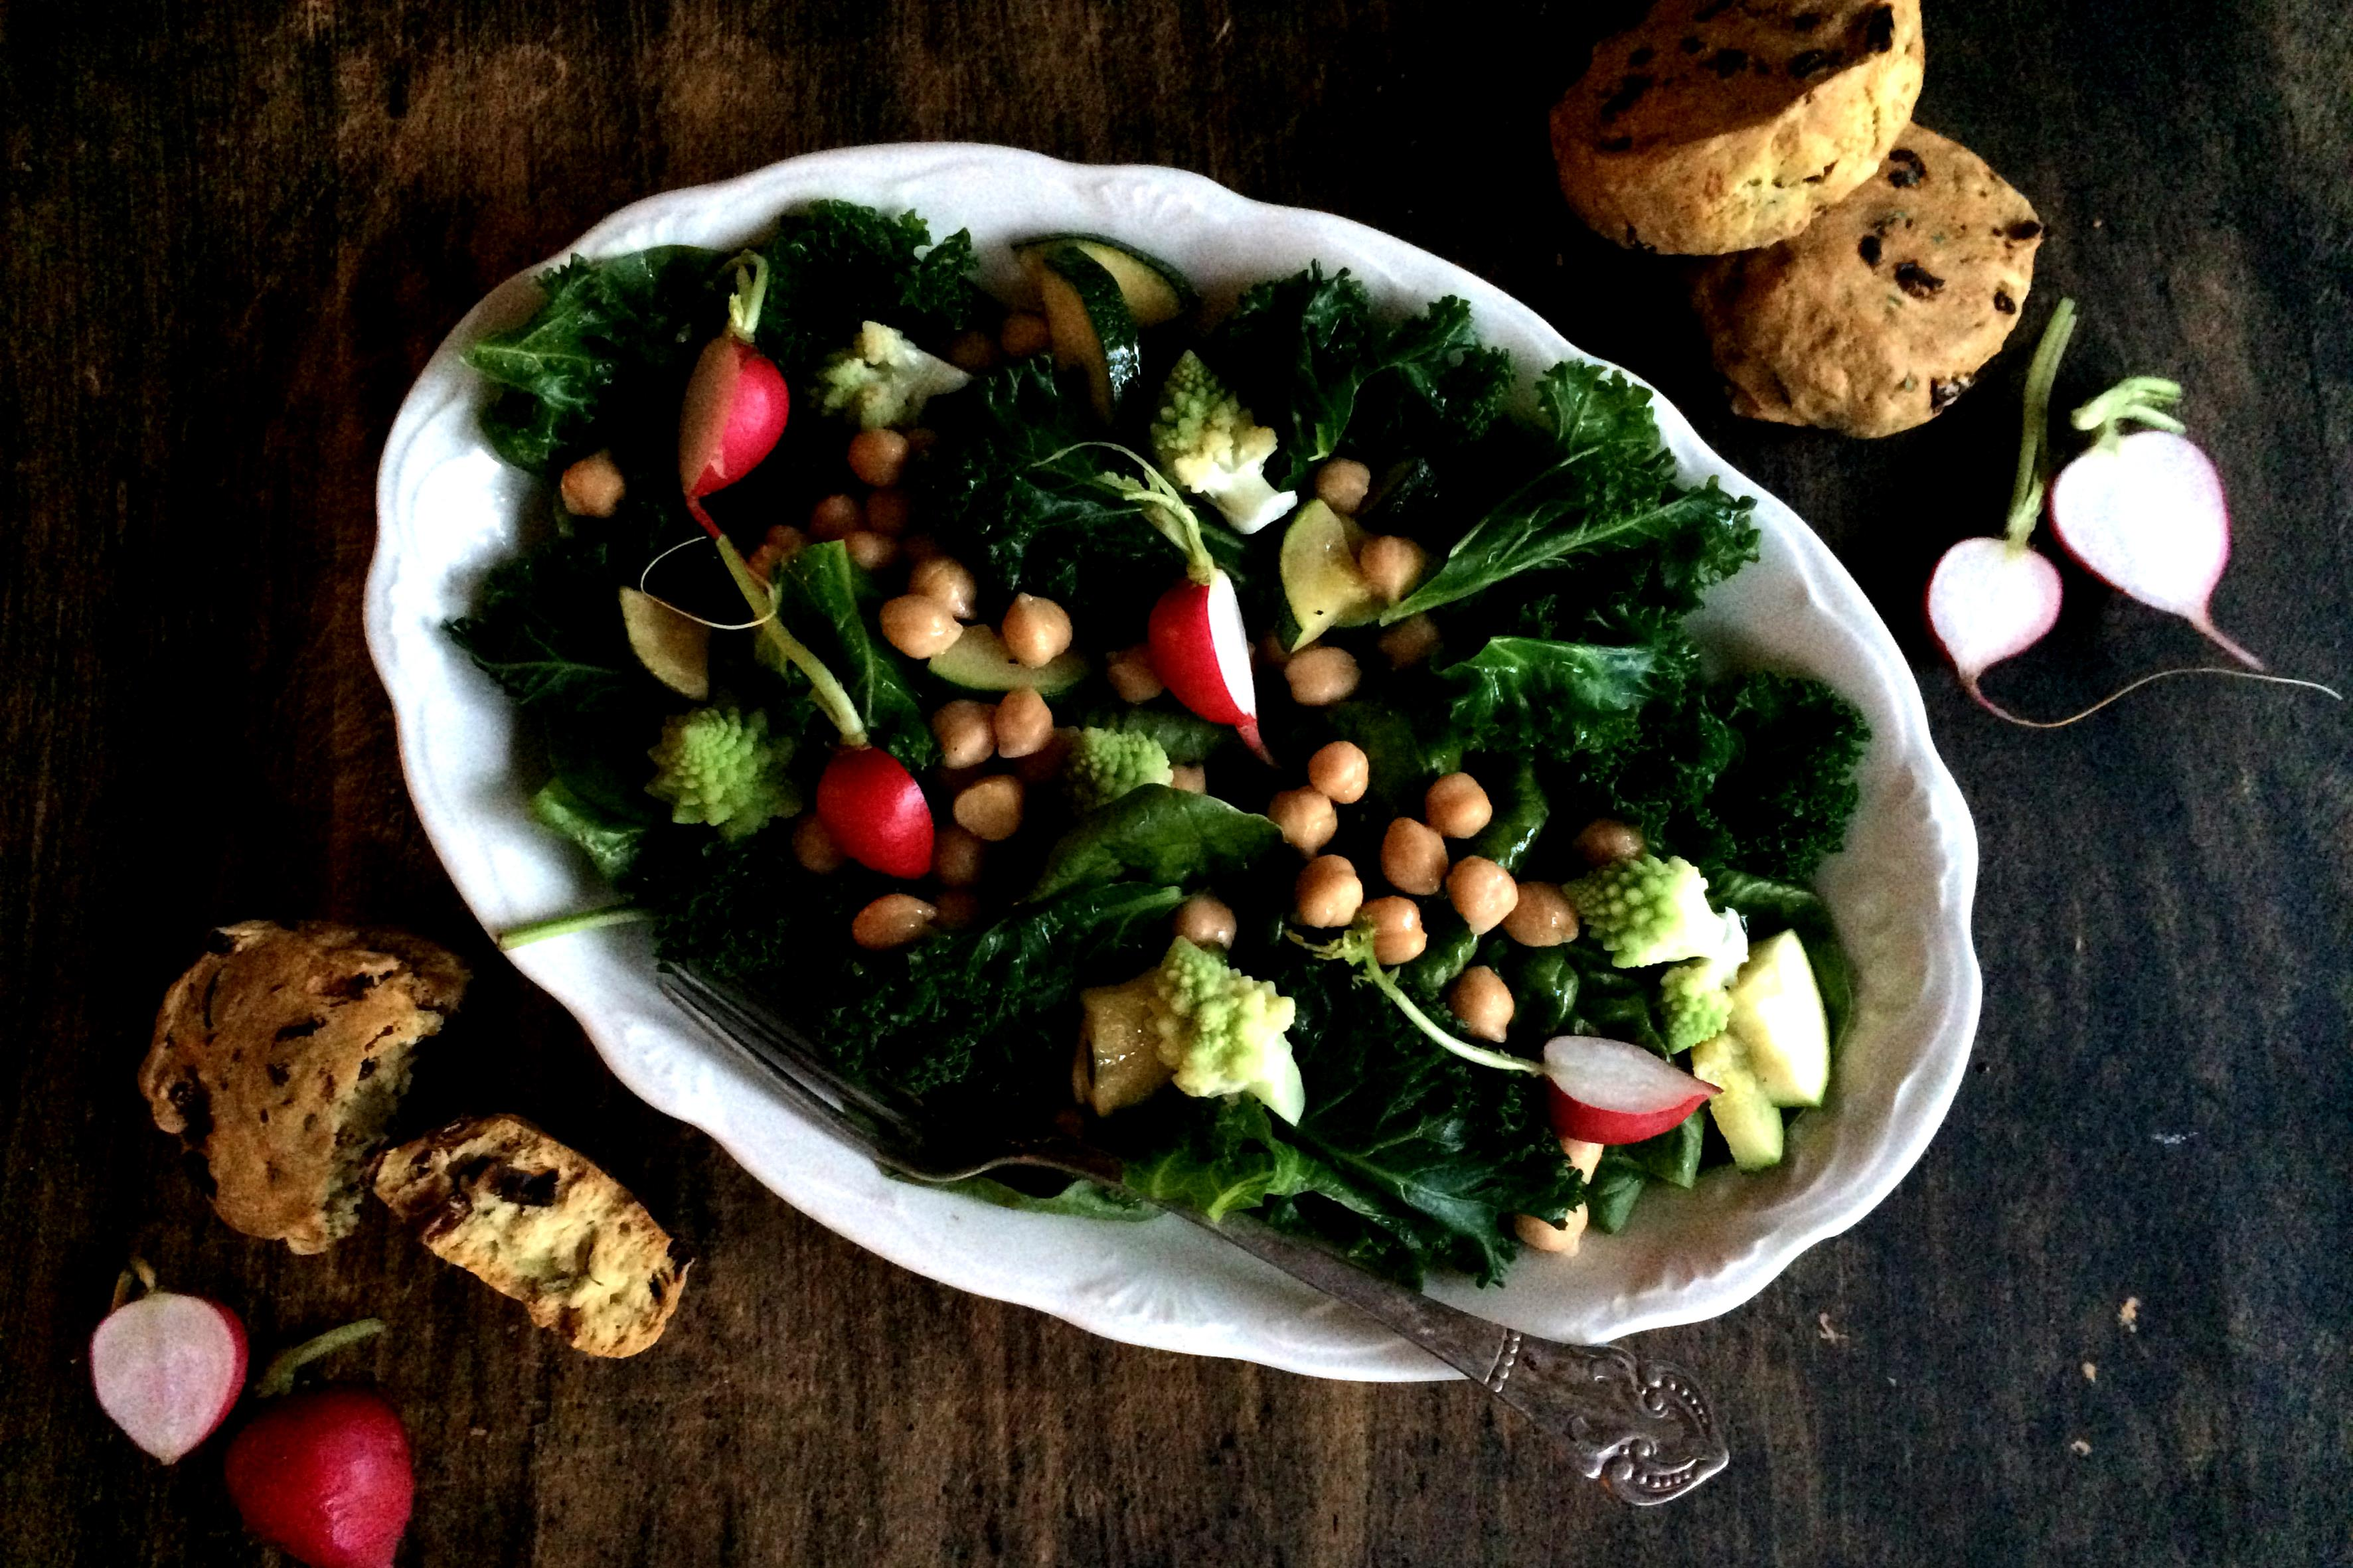 Green Winter Salad & Sunny Scones